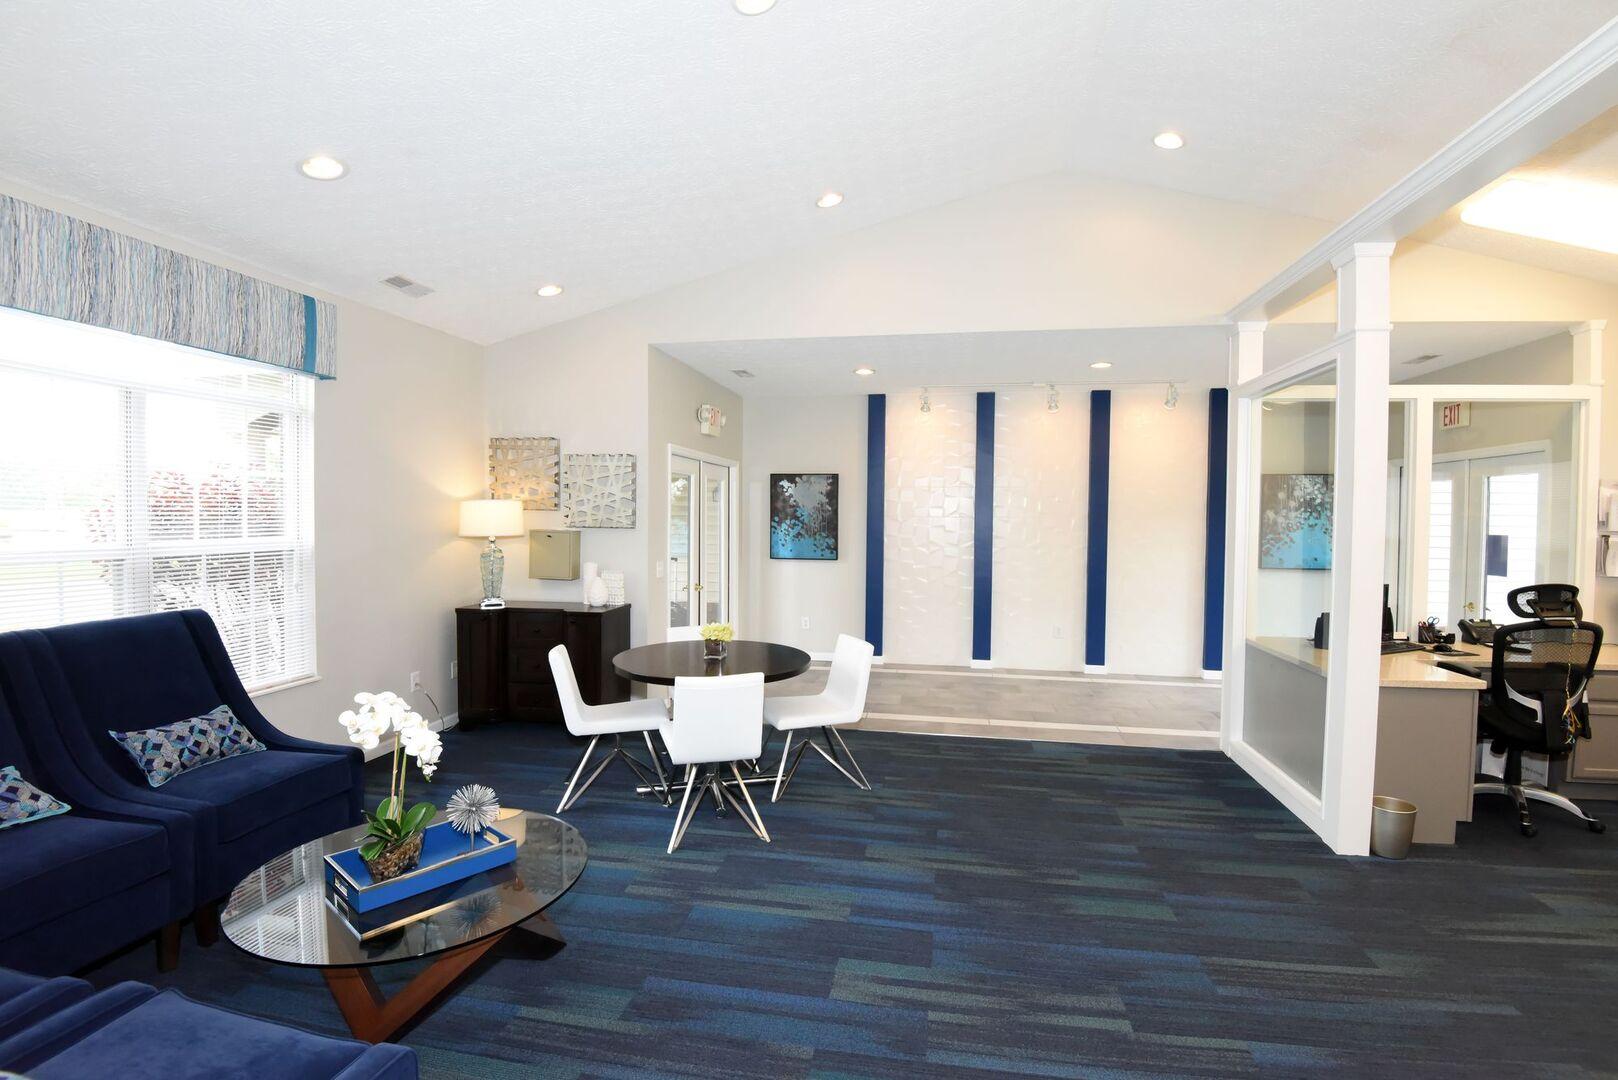 Apartments for Rent in Pickerington, OH | PRA - Pickerington